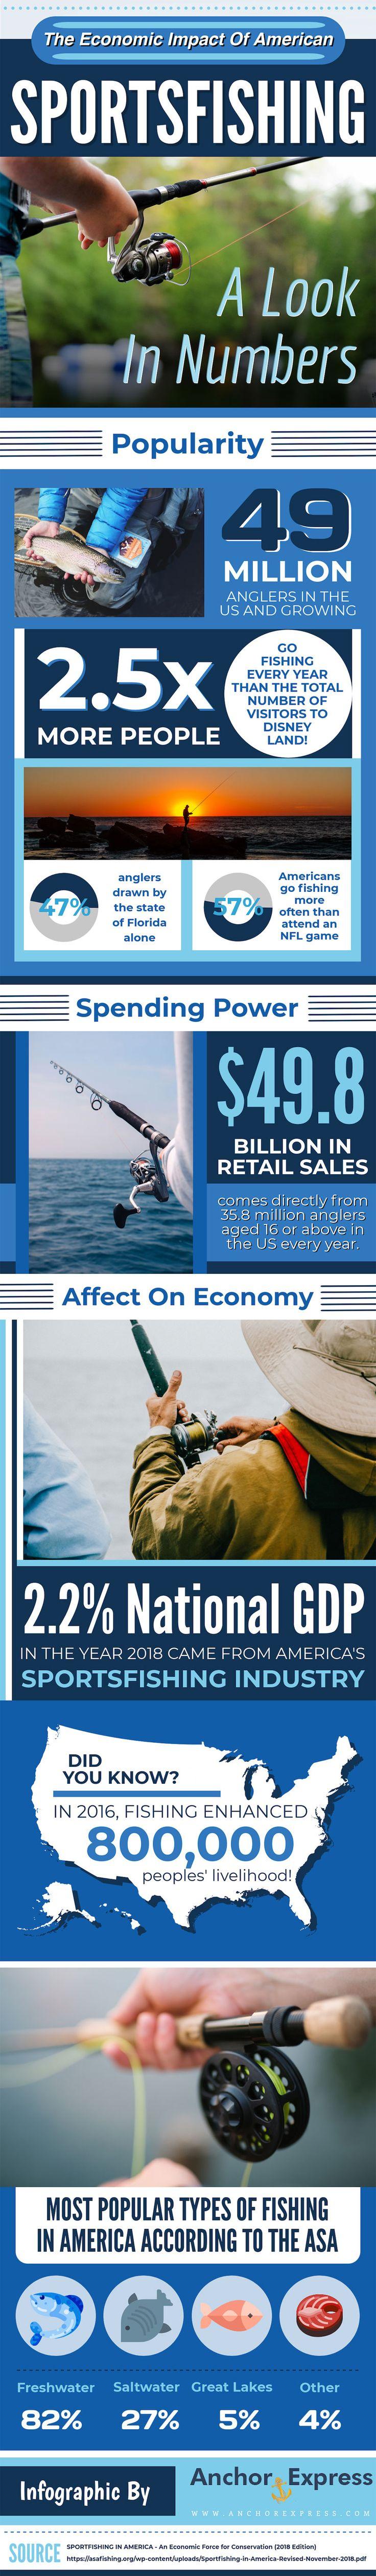 The Economic Impact of America Sportsfishing Infographic